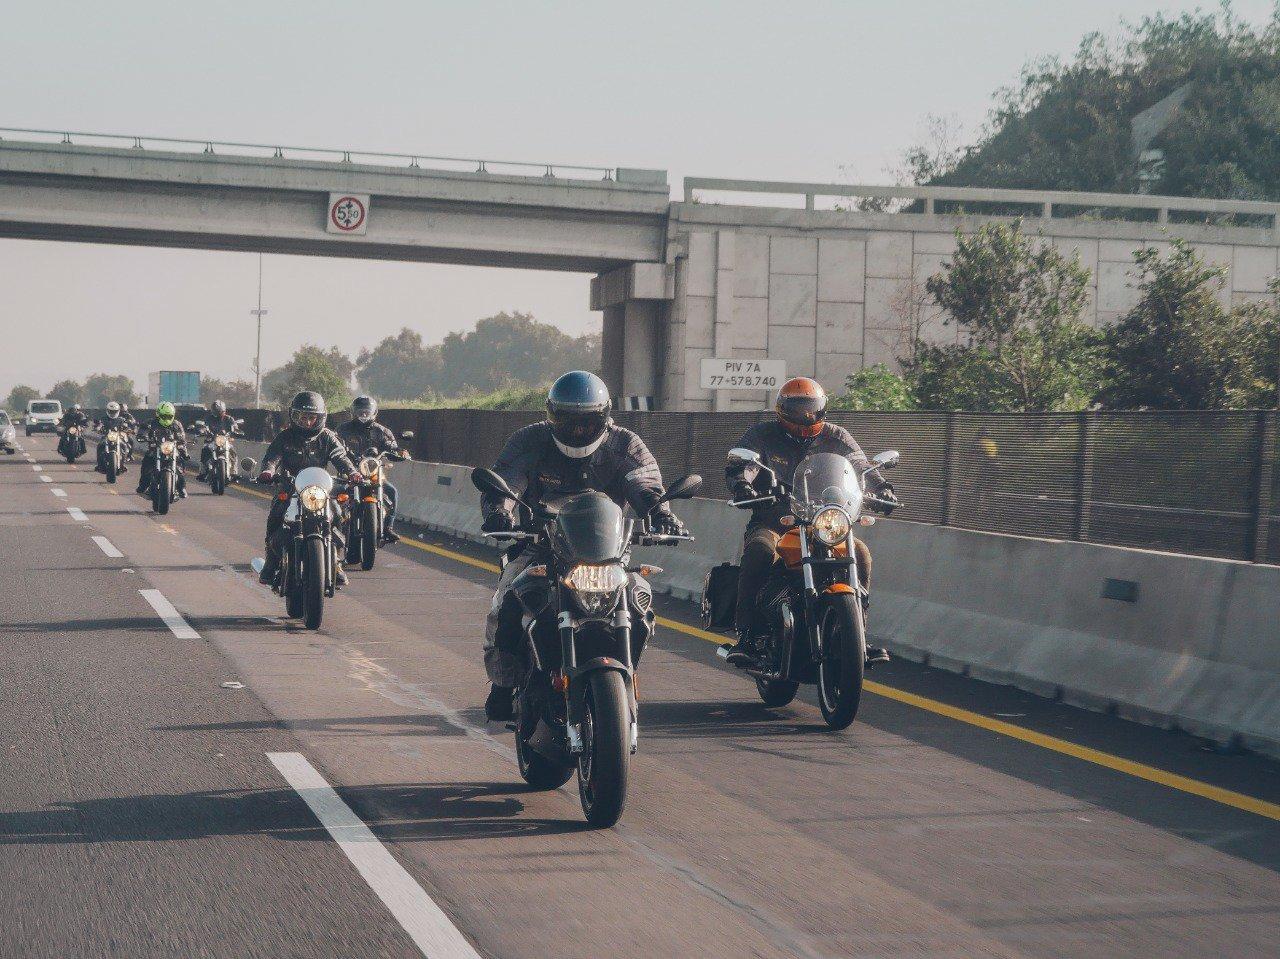 Moto Guzzi, estilo y desempeño a la italiana